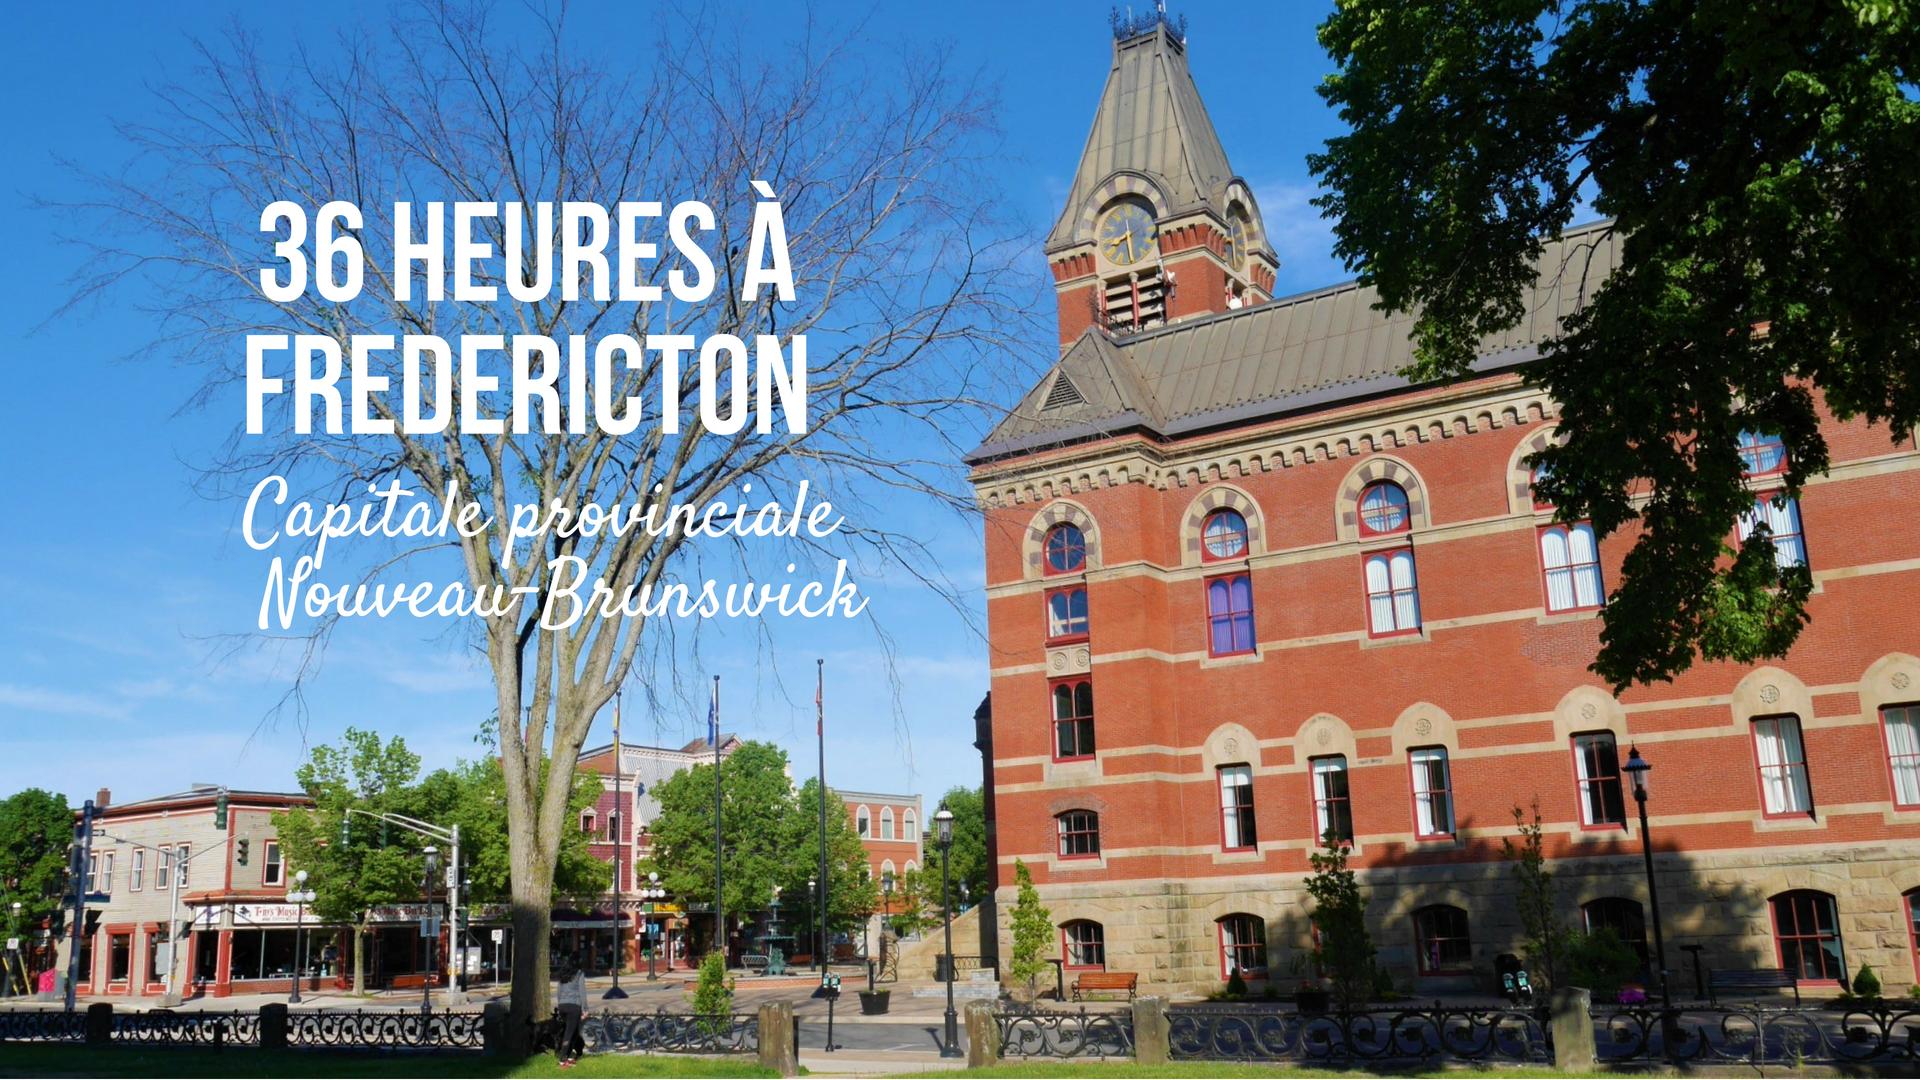 Fredericton voyage tourisme nouveau-brunswick canada